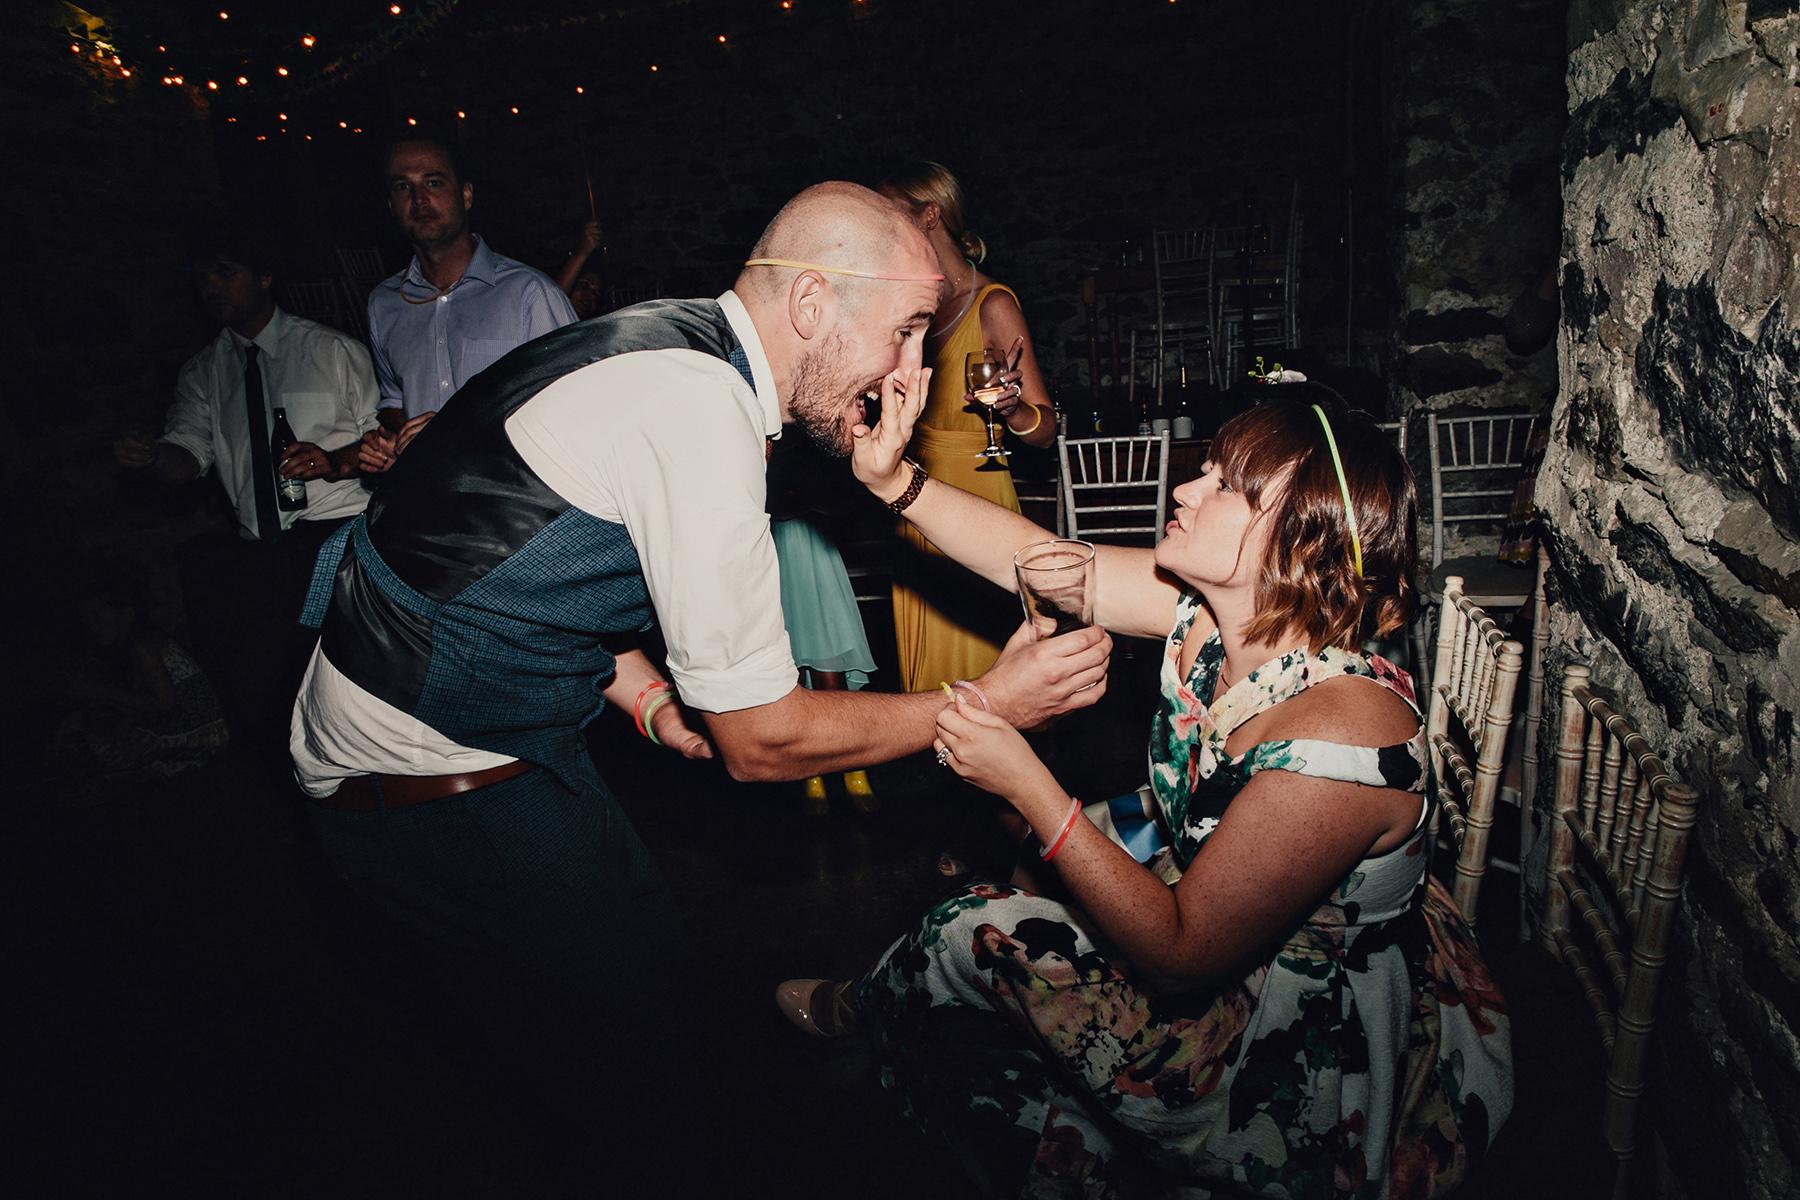 Snowdonia-Wales-Wedding-Photos-0420.jpg